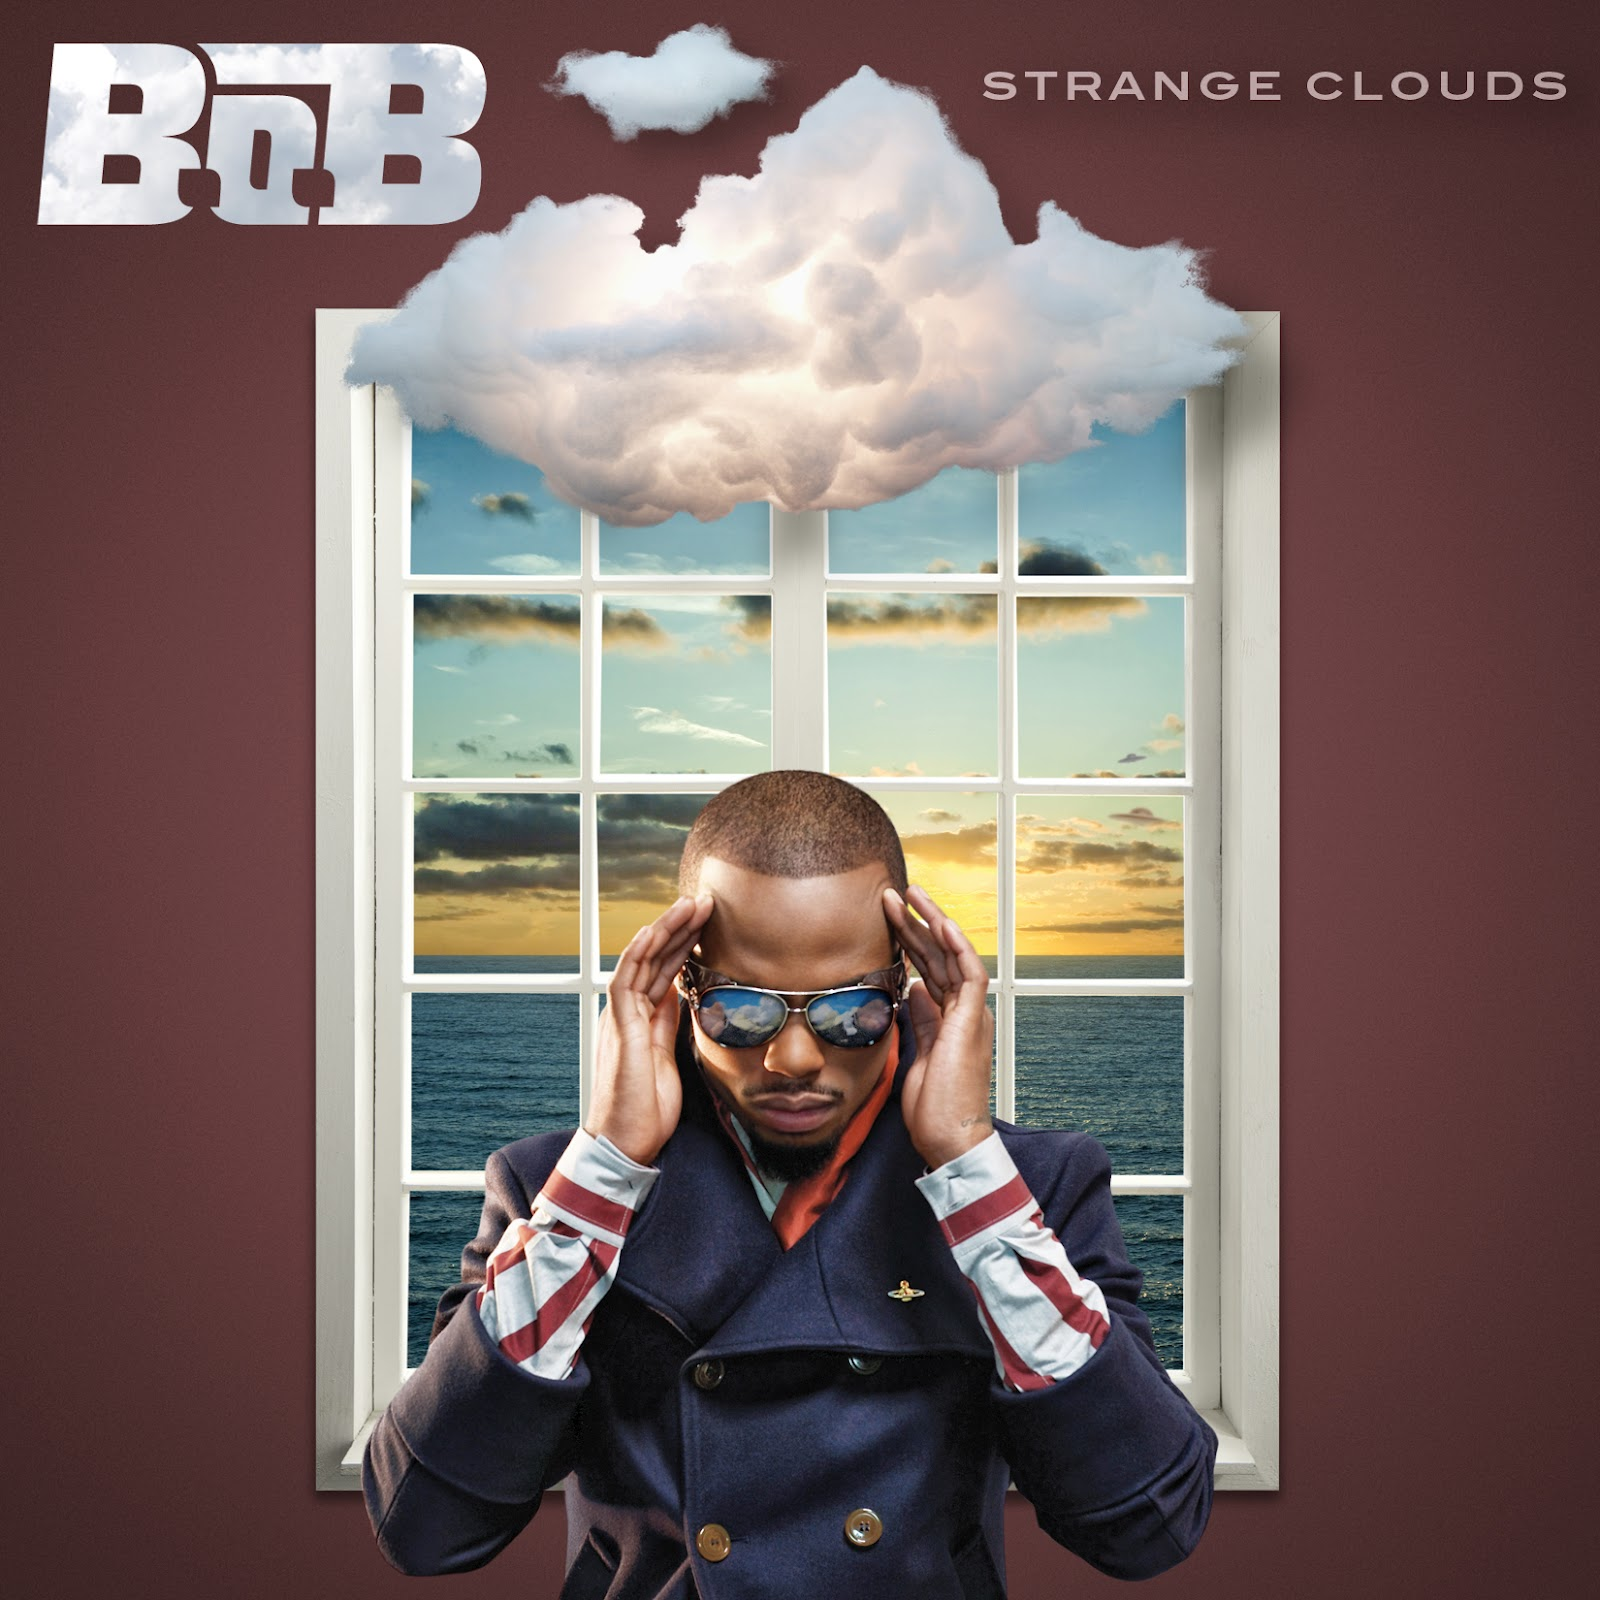 http://3.bp.blogspot.com/-pfx28sNMD10/T86rylJC2XI/AAAAAAAAAgA/V80Y3z1GSZo/s1600/20120502012922%21B.o.B_-_Strange_Clouds_-_LP_Cover.jpg